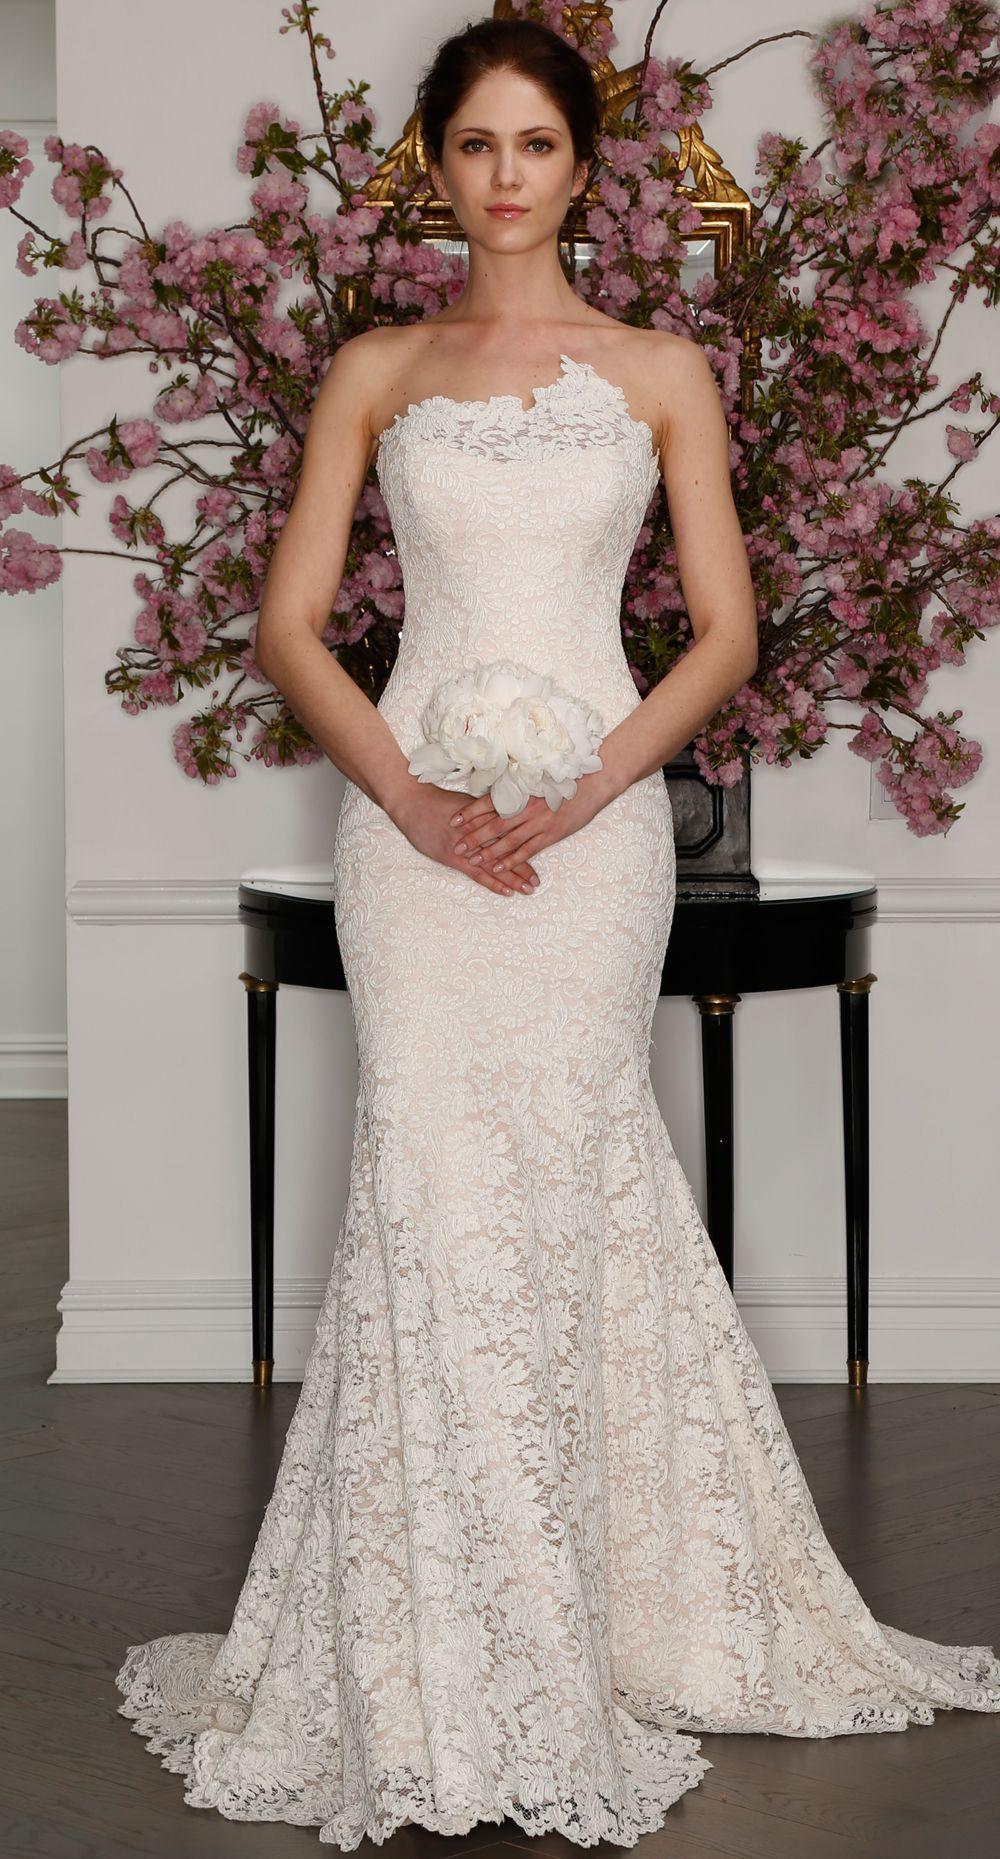 Blush mermaid wedding dress  Legends by Romona Keveza Shows Timeless Wedding Dresses for Spring